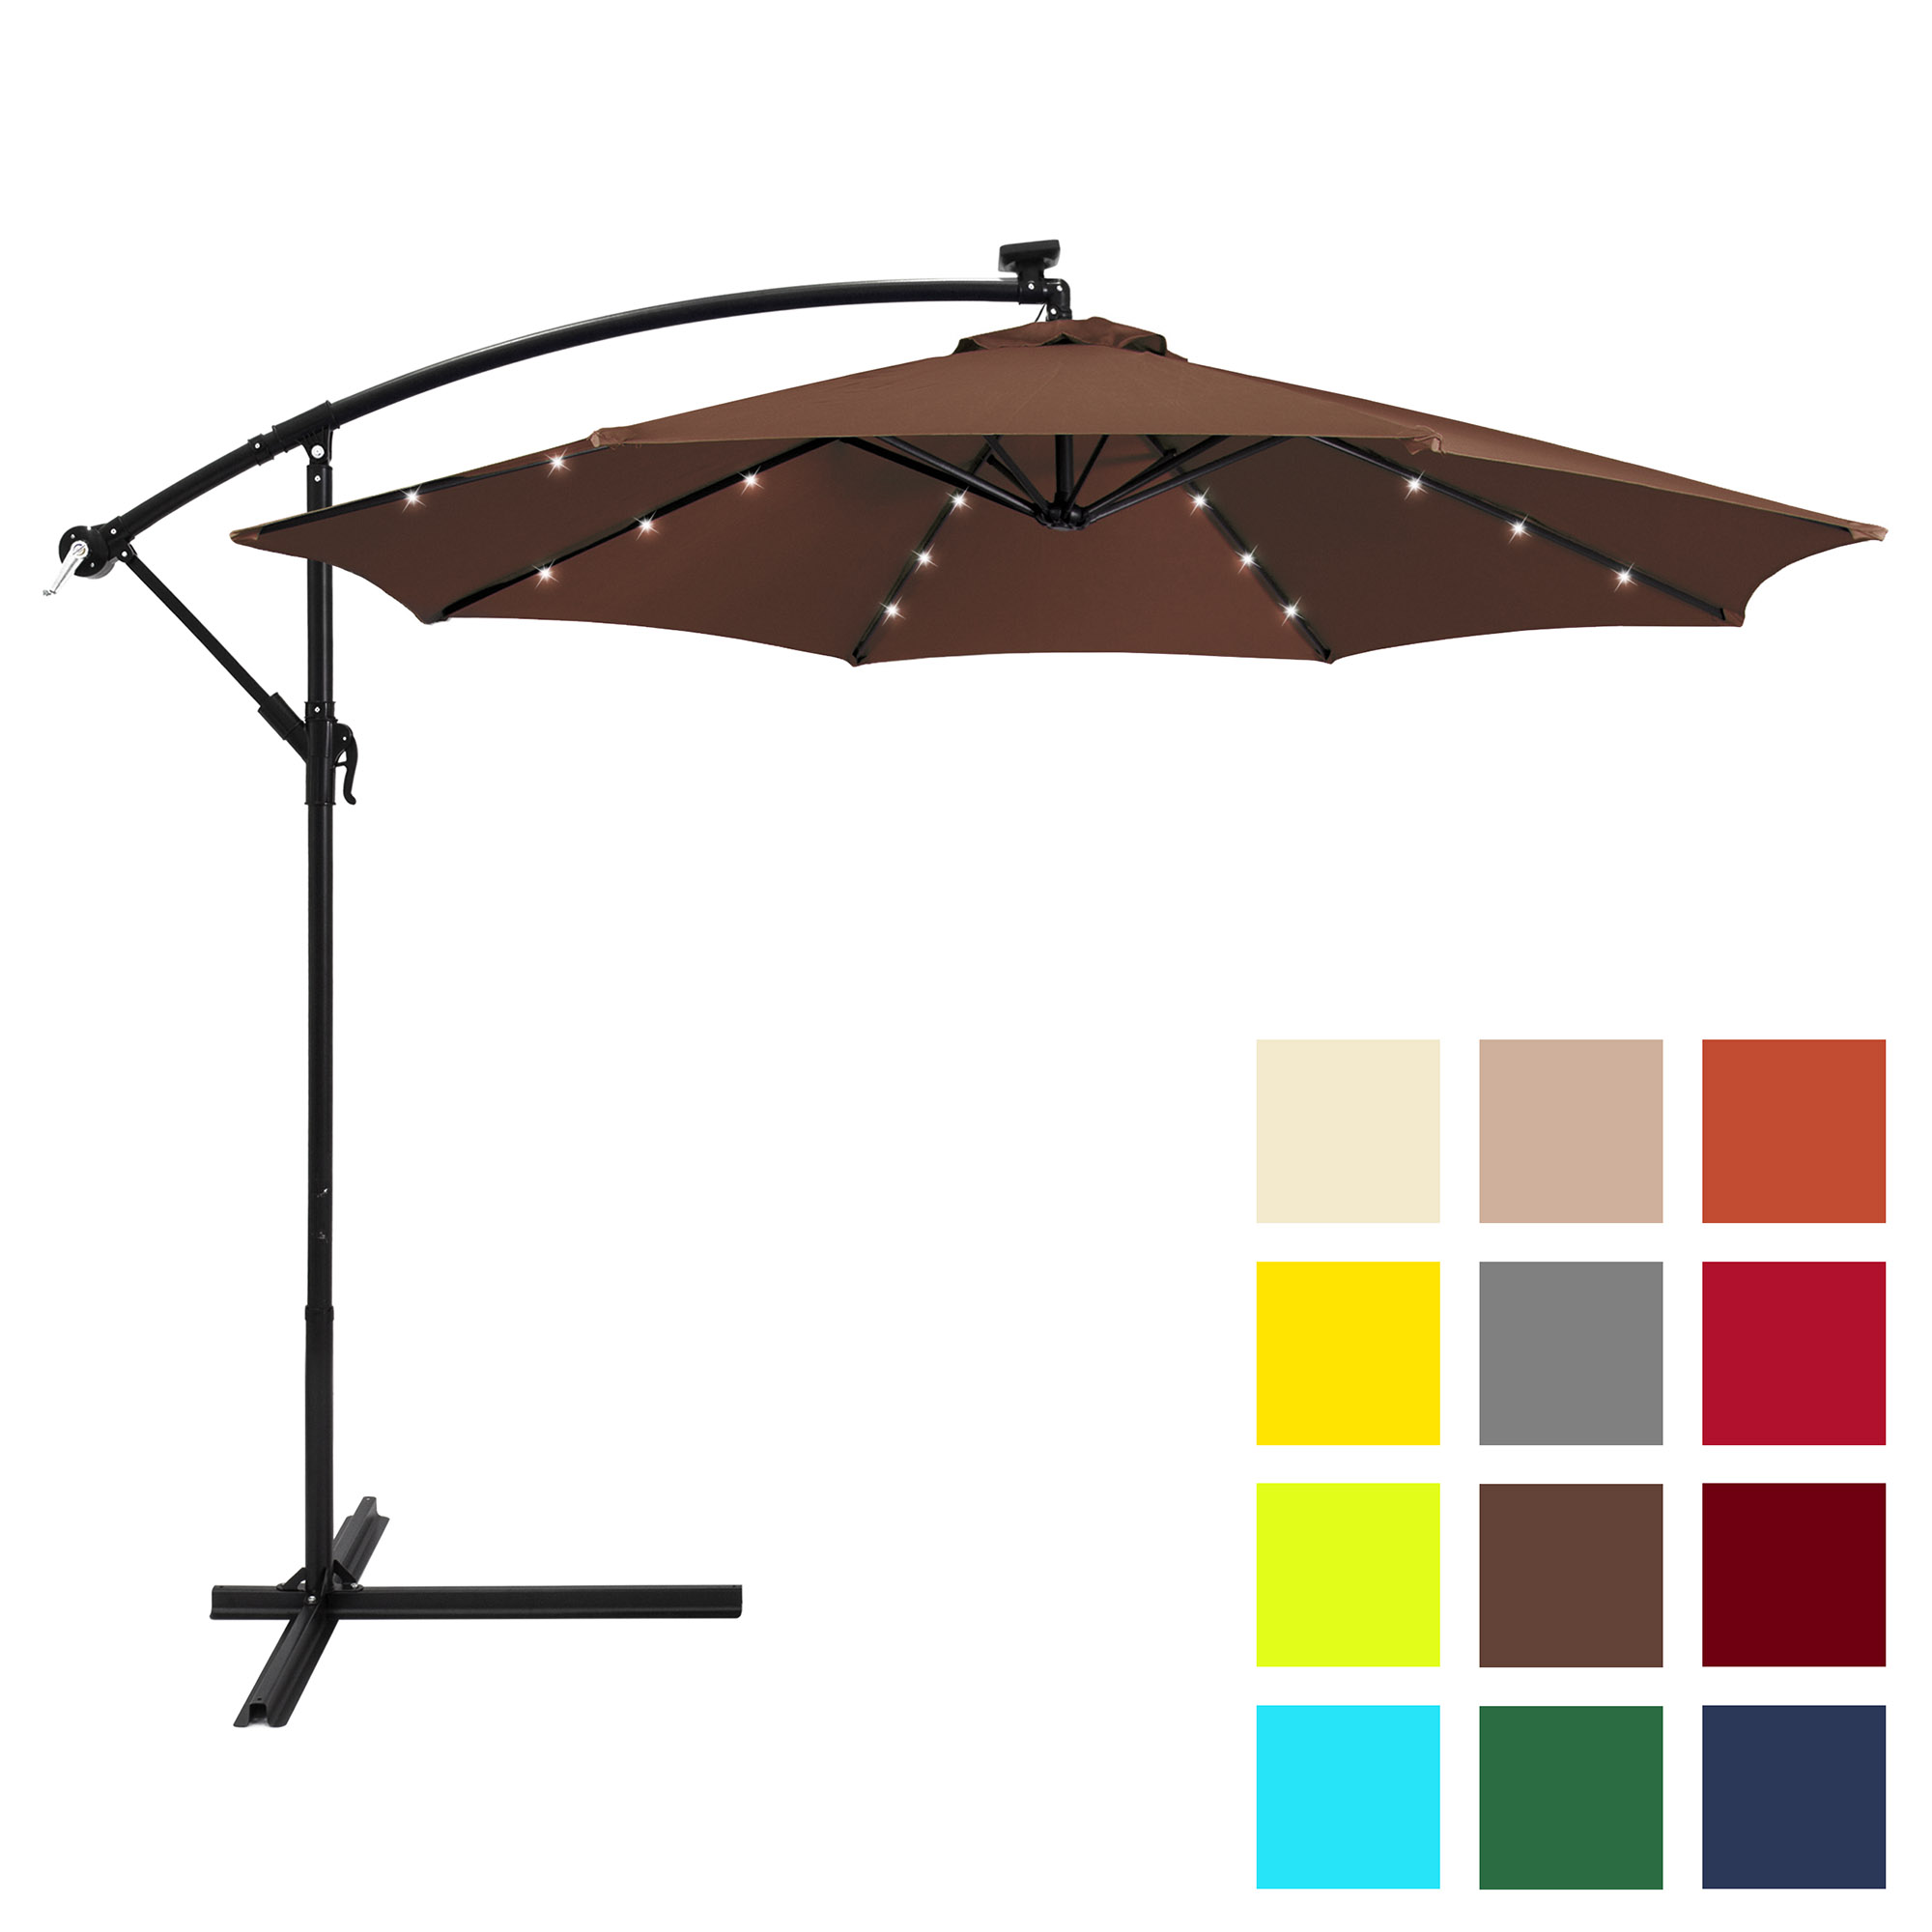 Best Choice Products 10ft Solar LED Patio Offset Umbrella w/ Easy Tilt Adjustment - Brown